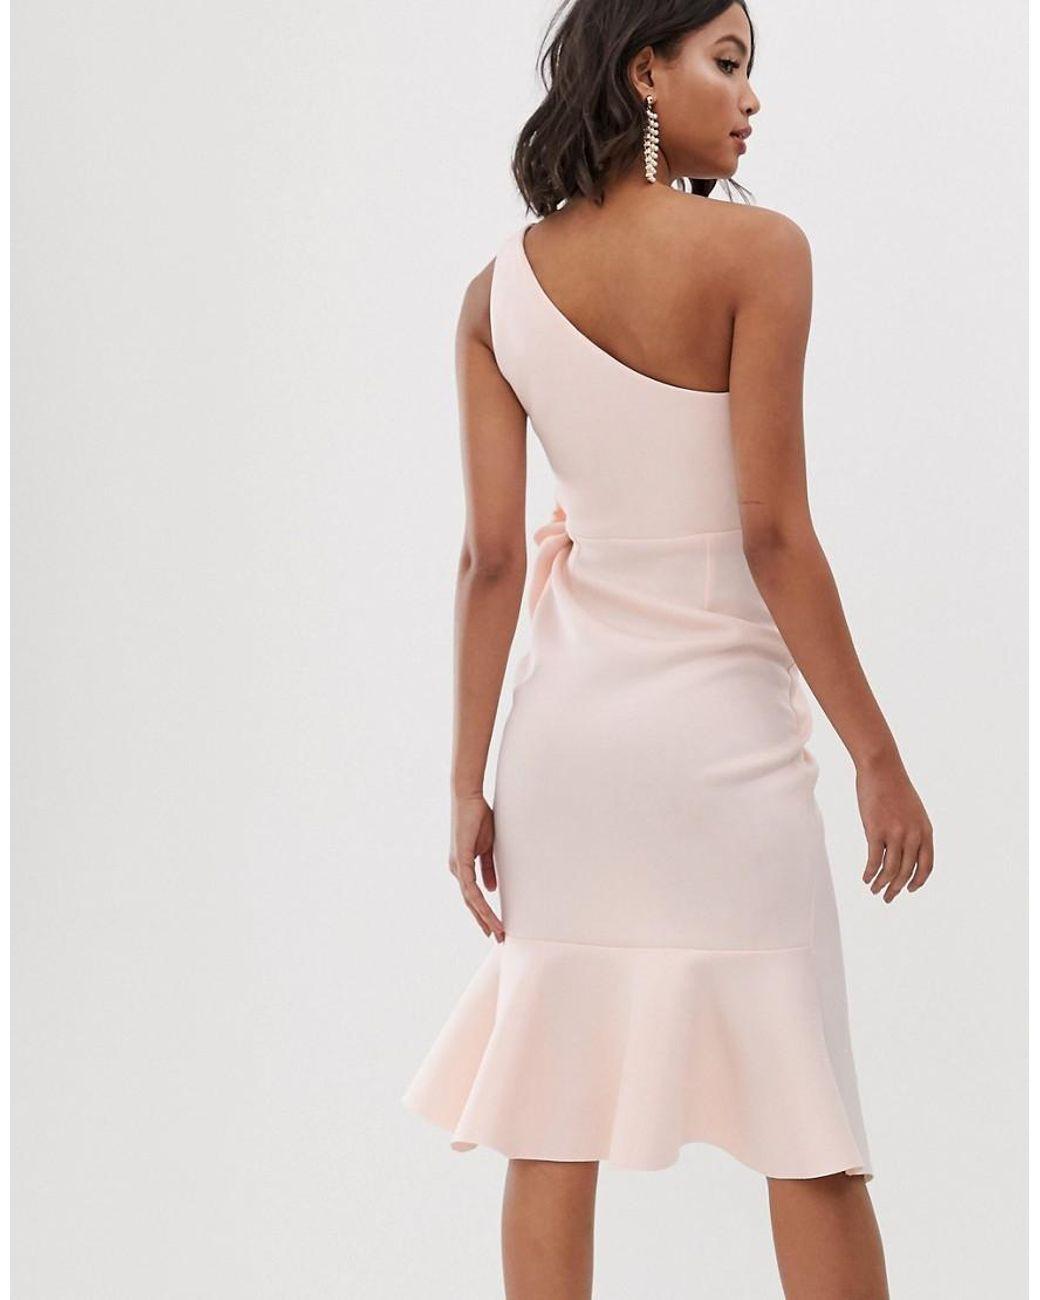 5c6d6f0b32 ASOS One Shoulder Tuck Detail Midi Dress in Pink - Lyst